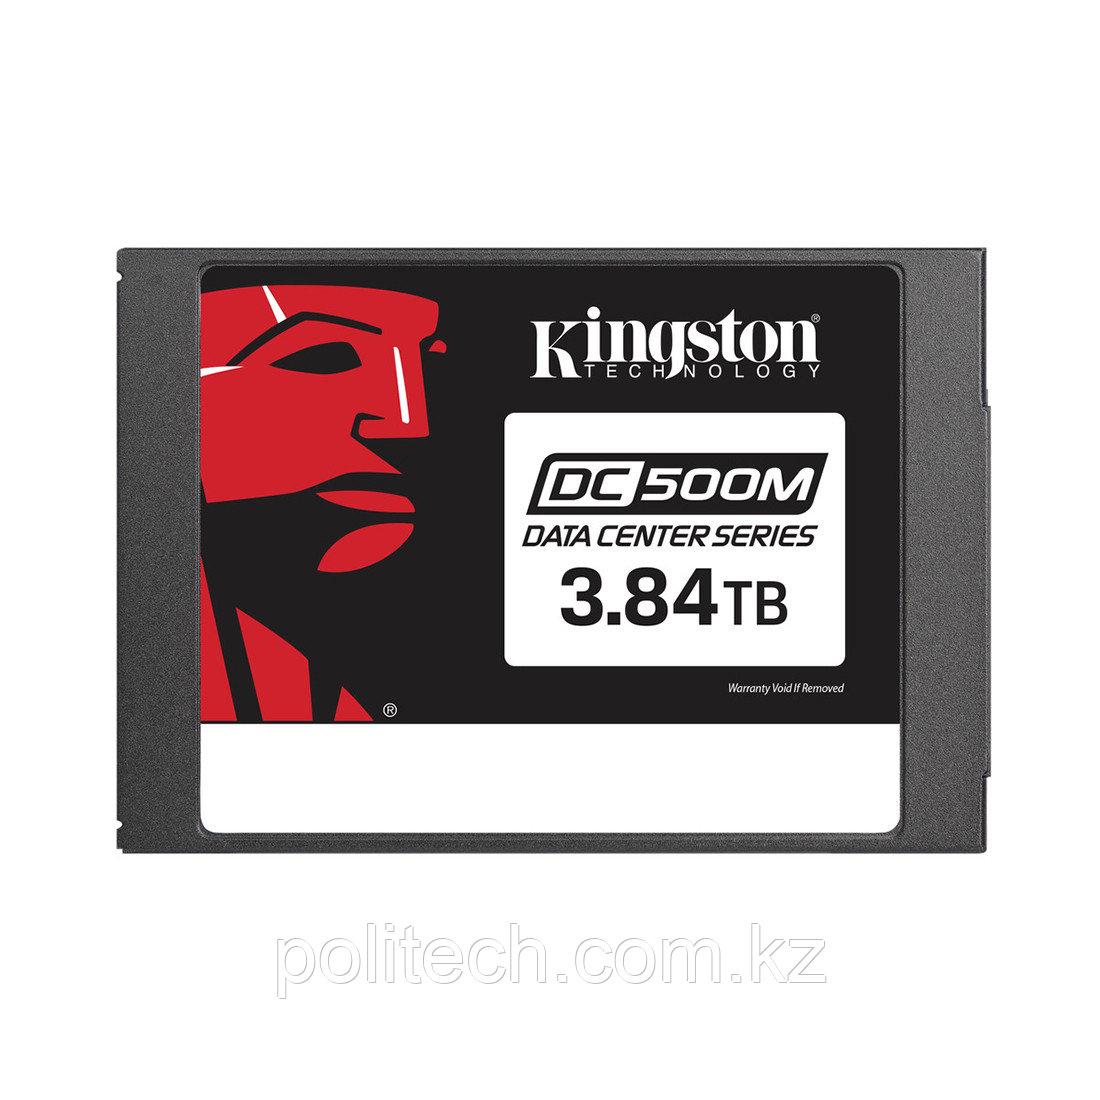 Твердотельный накопитель SSD Kingston SEDC500M/3840G SATA 7мм